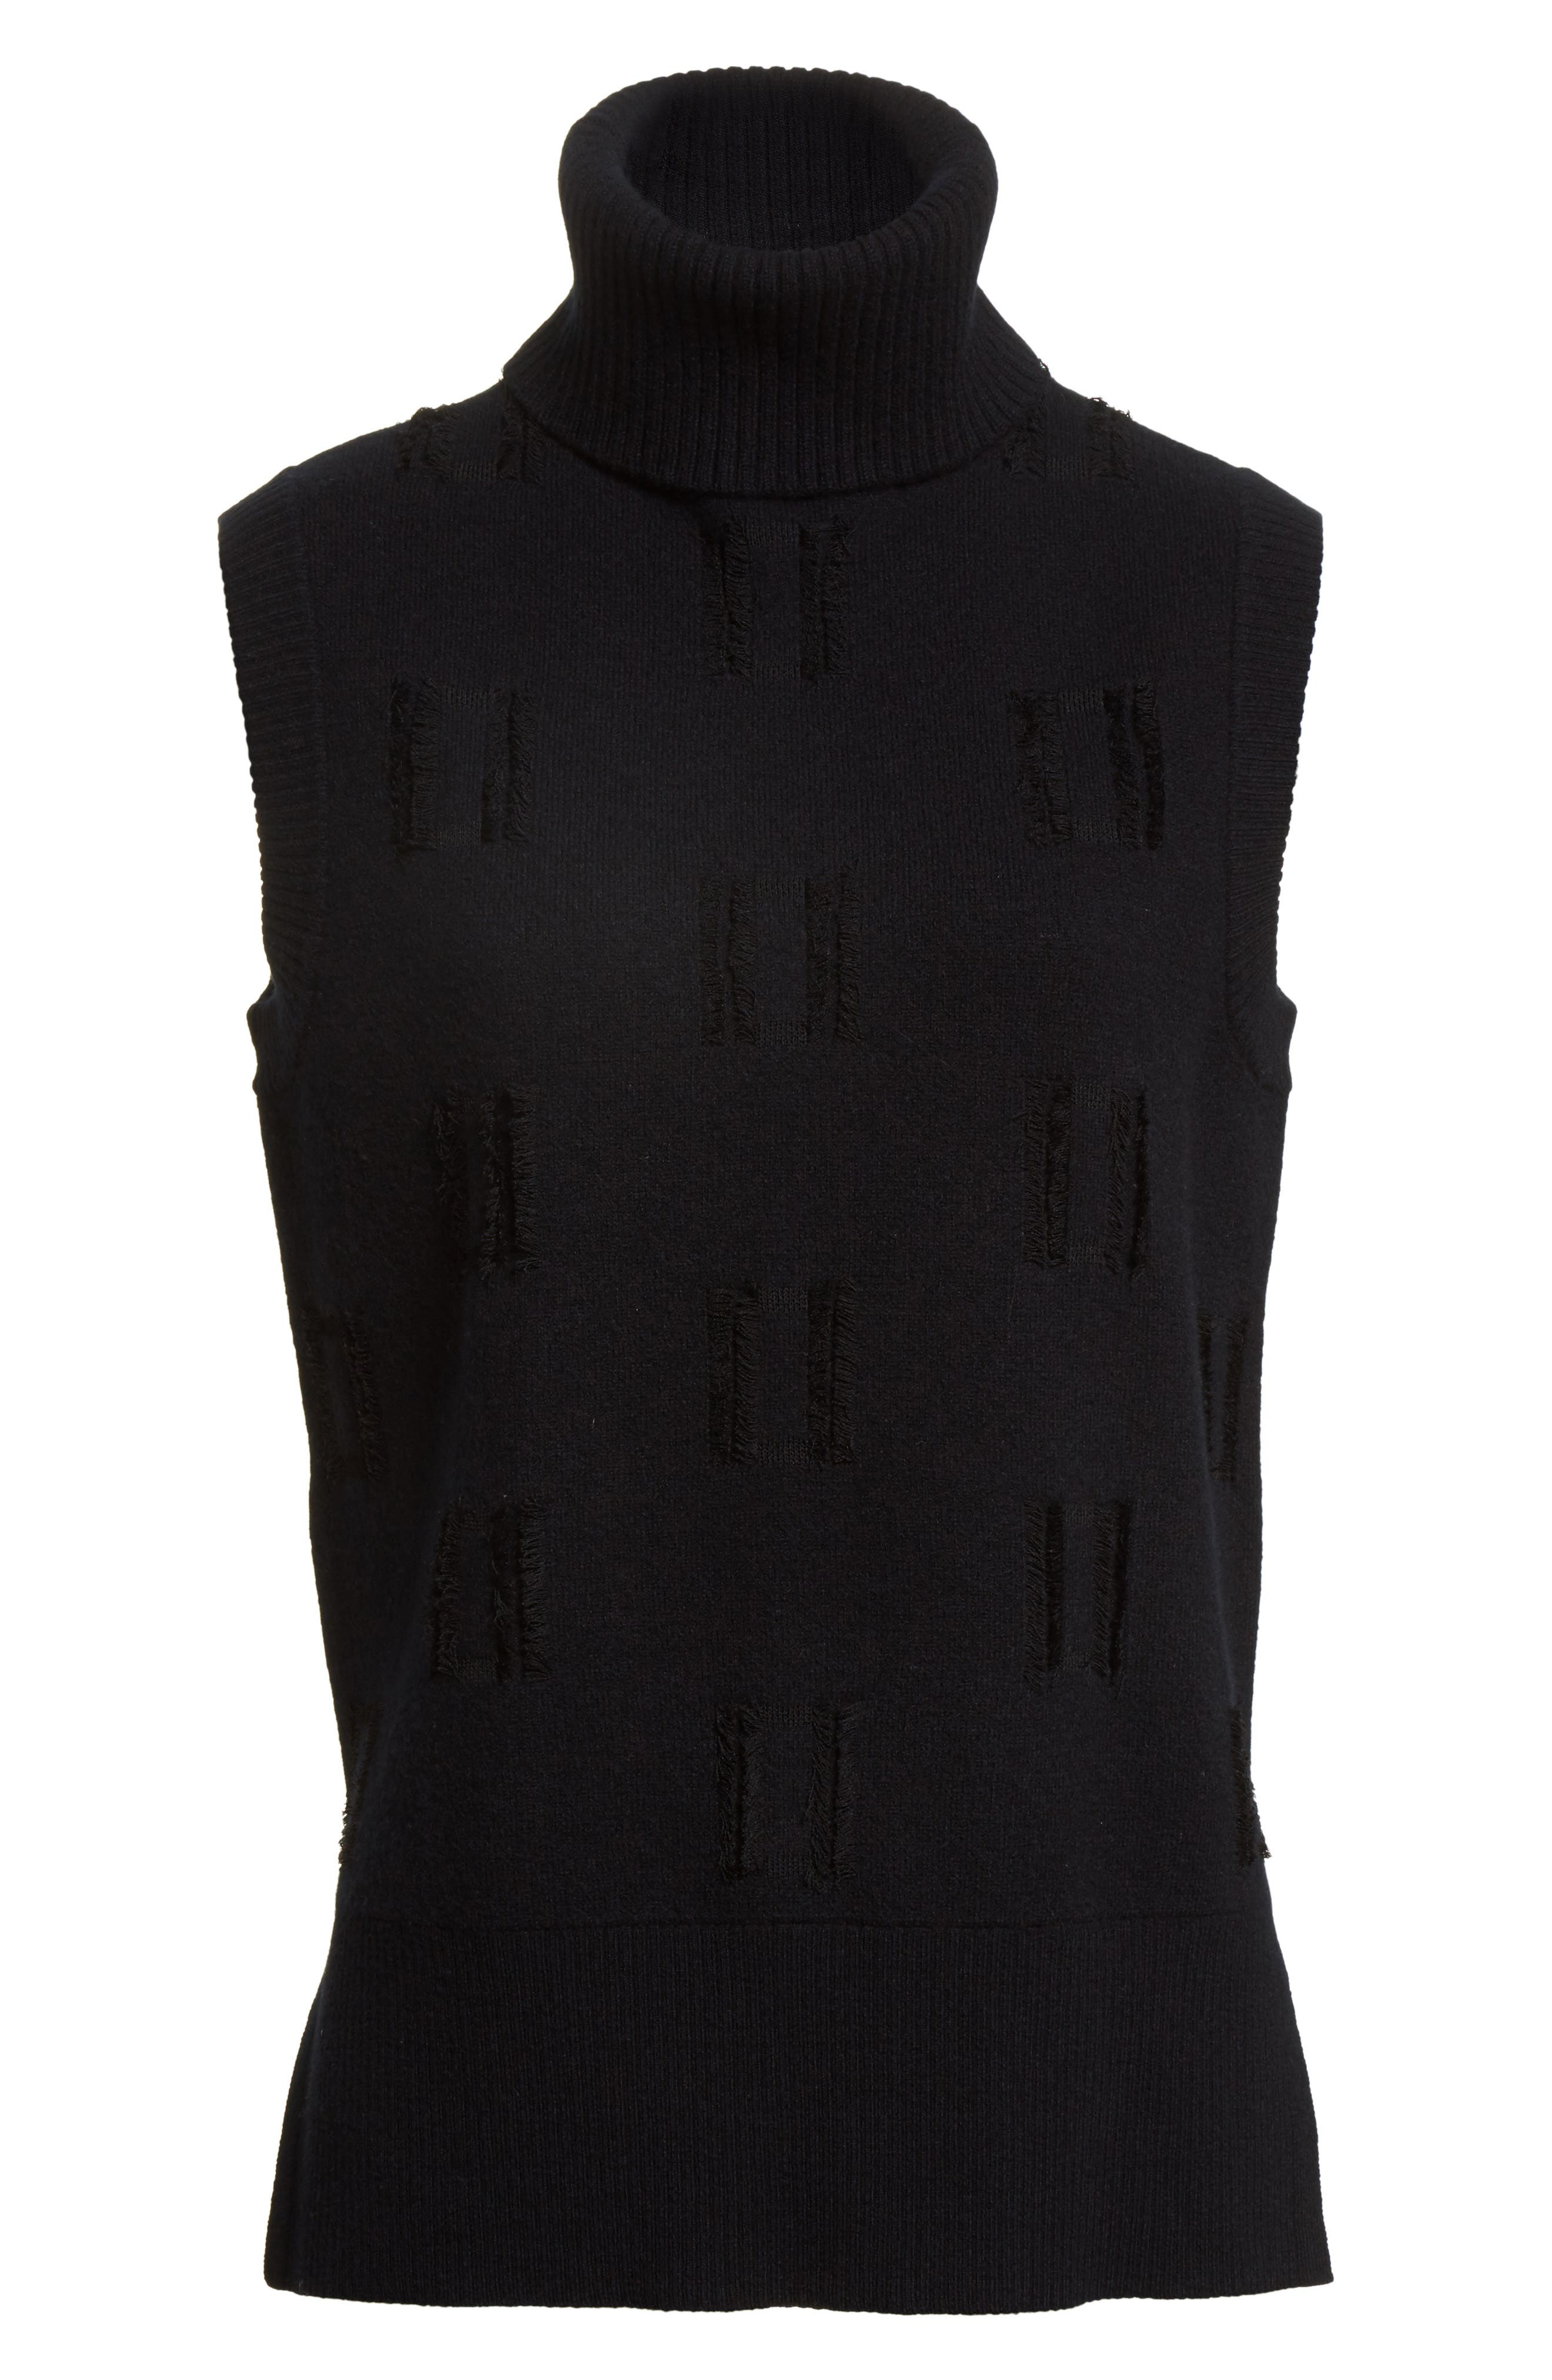 Fringe Trim Turtleneck Sweater,                             Alternate thumbnail 6, color,                             Black